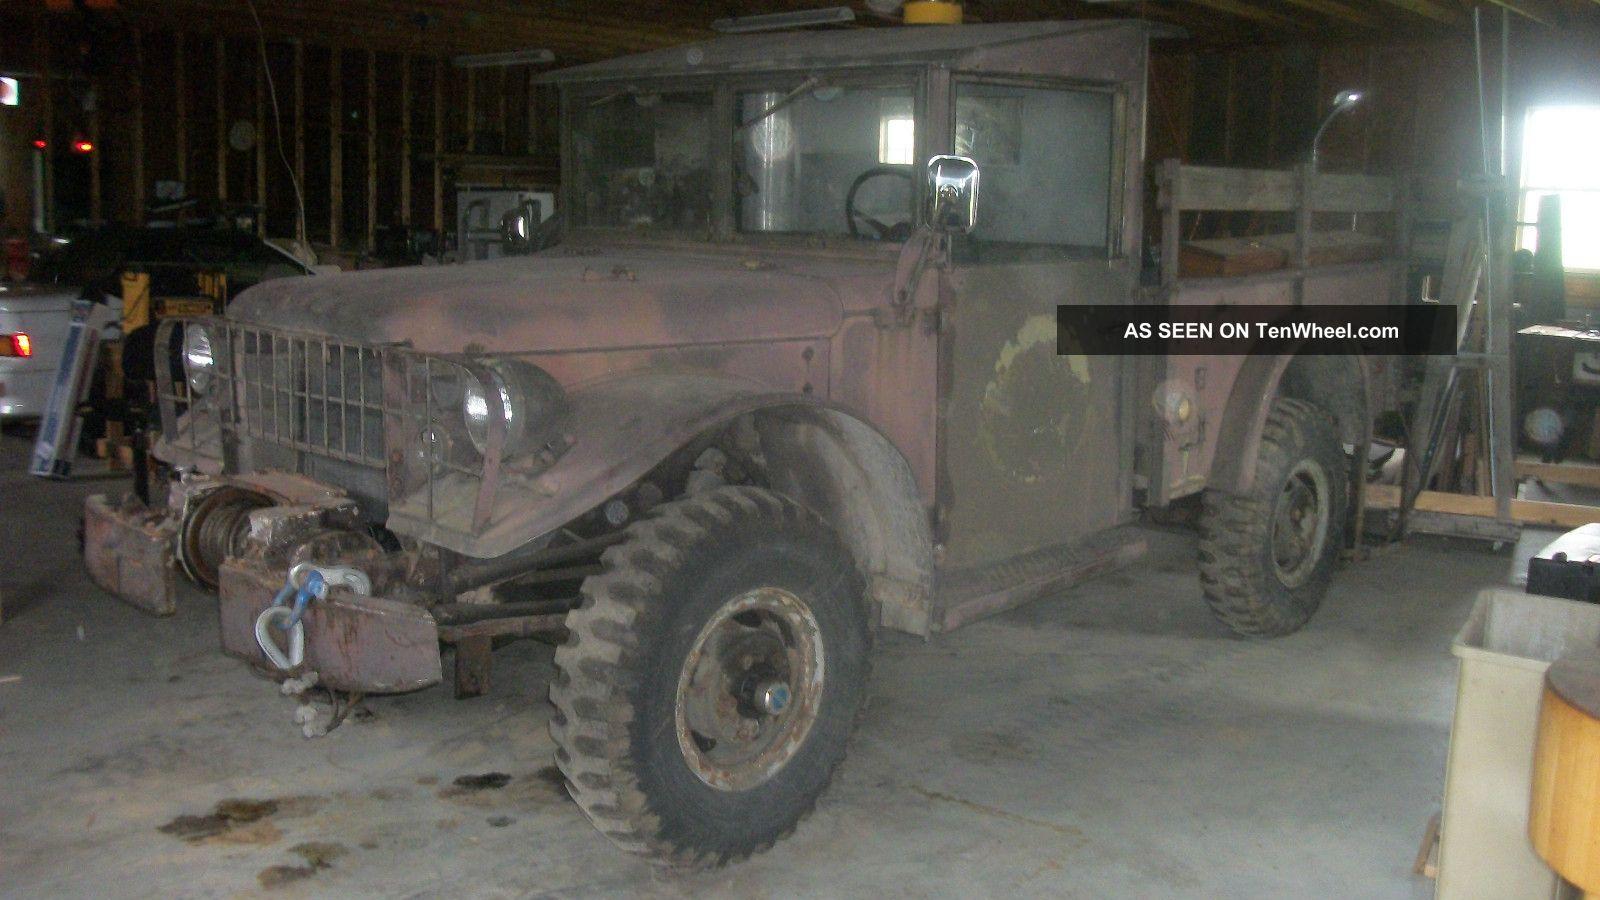 1954 Dodge M37 Power Wagon Troop Transport Vehicle Power Wagon photo